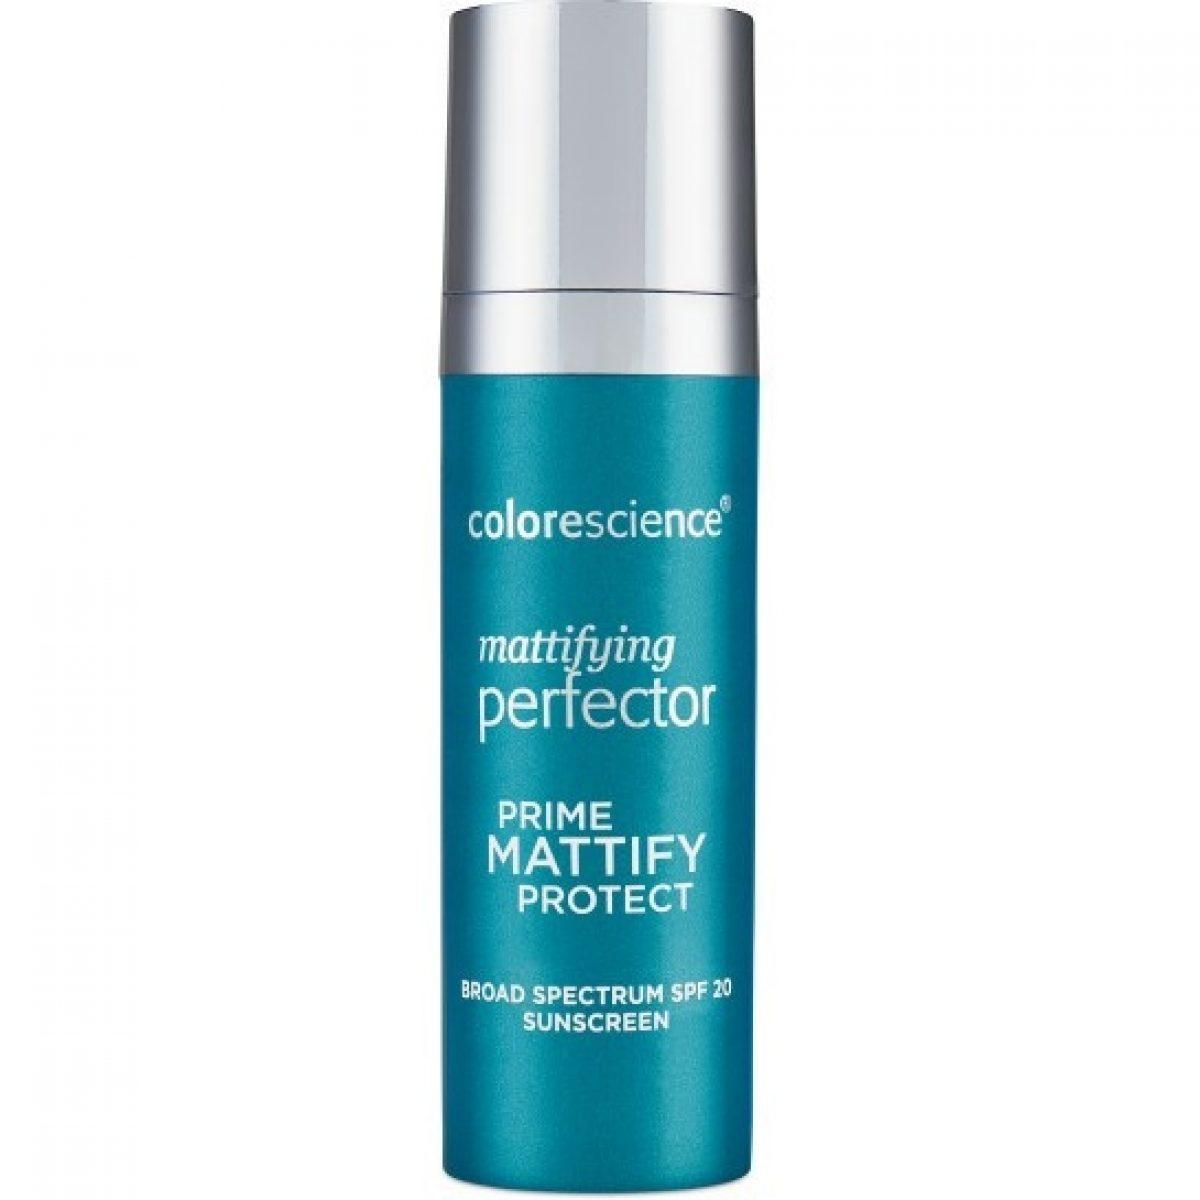 Mattifying Perfector SPF 20